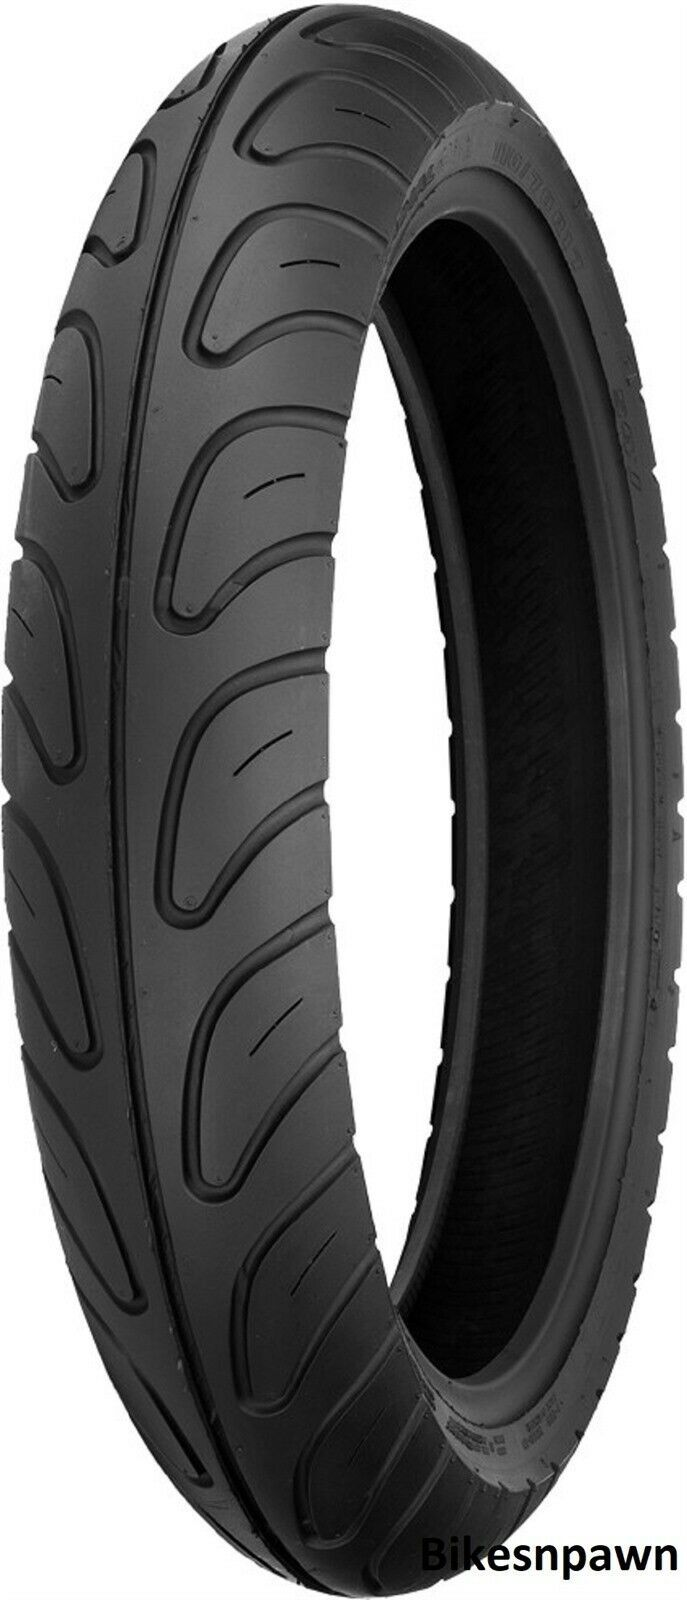 New Shinko 006 Podium Radial 120/60ZR17 Front Motorcycle Performance Tire 55W